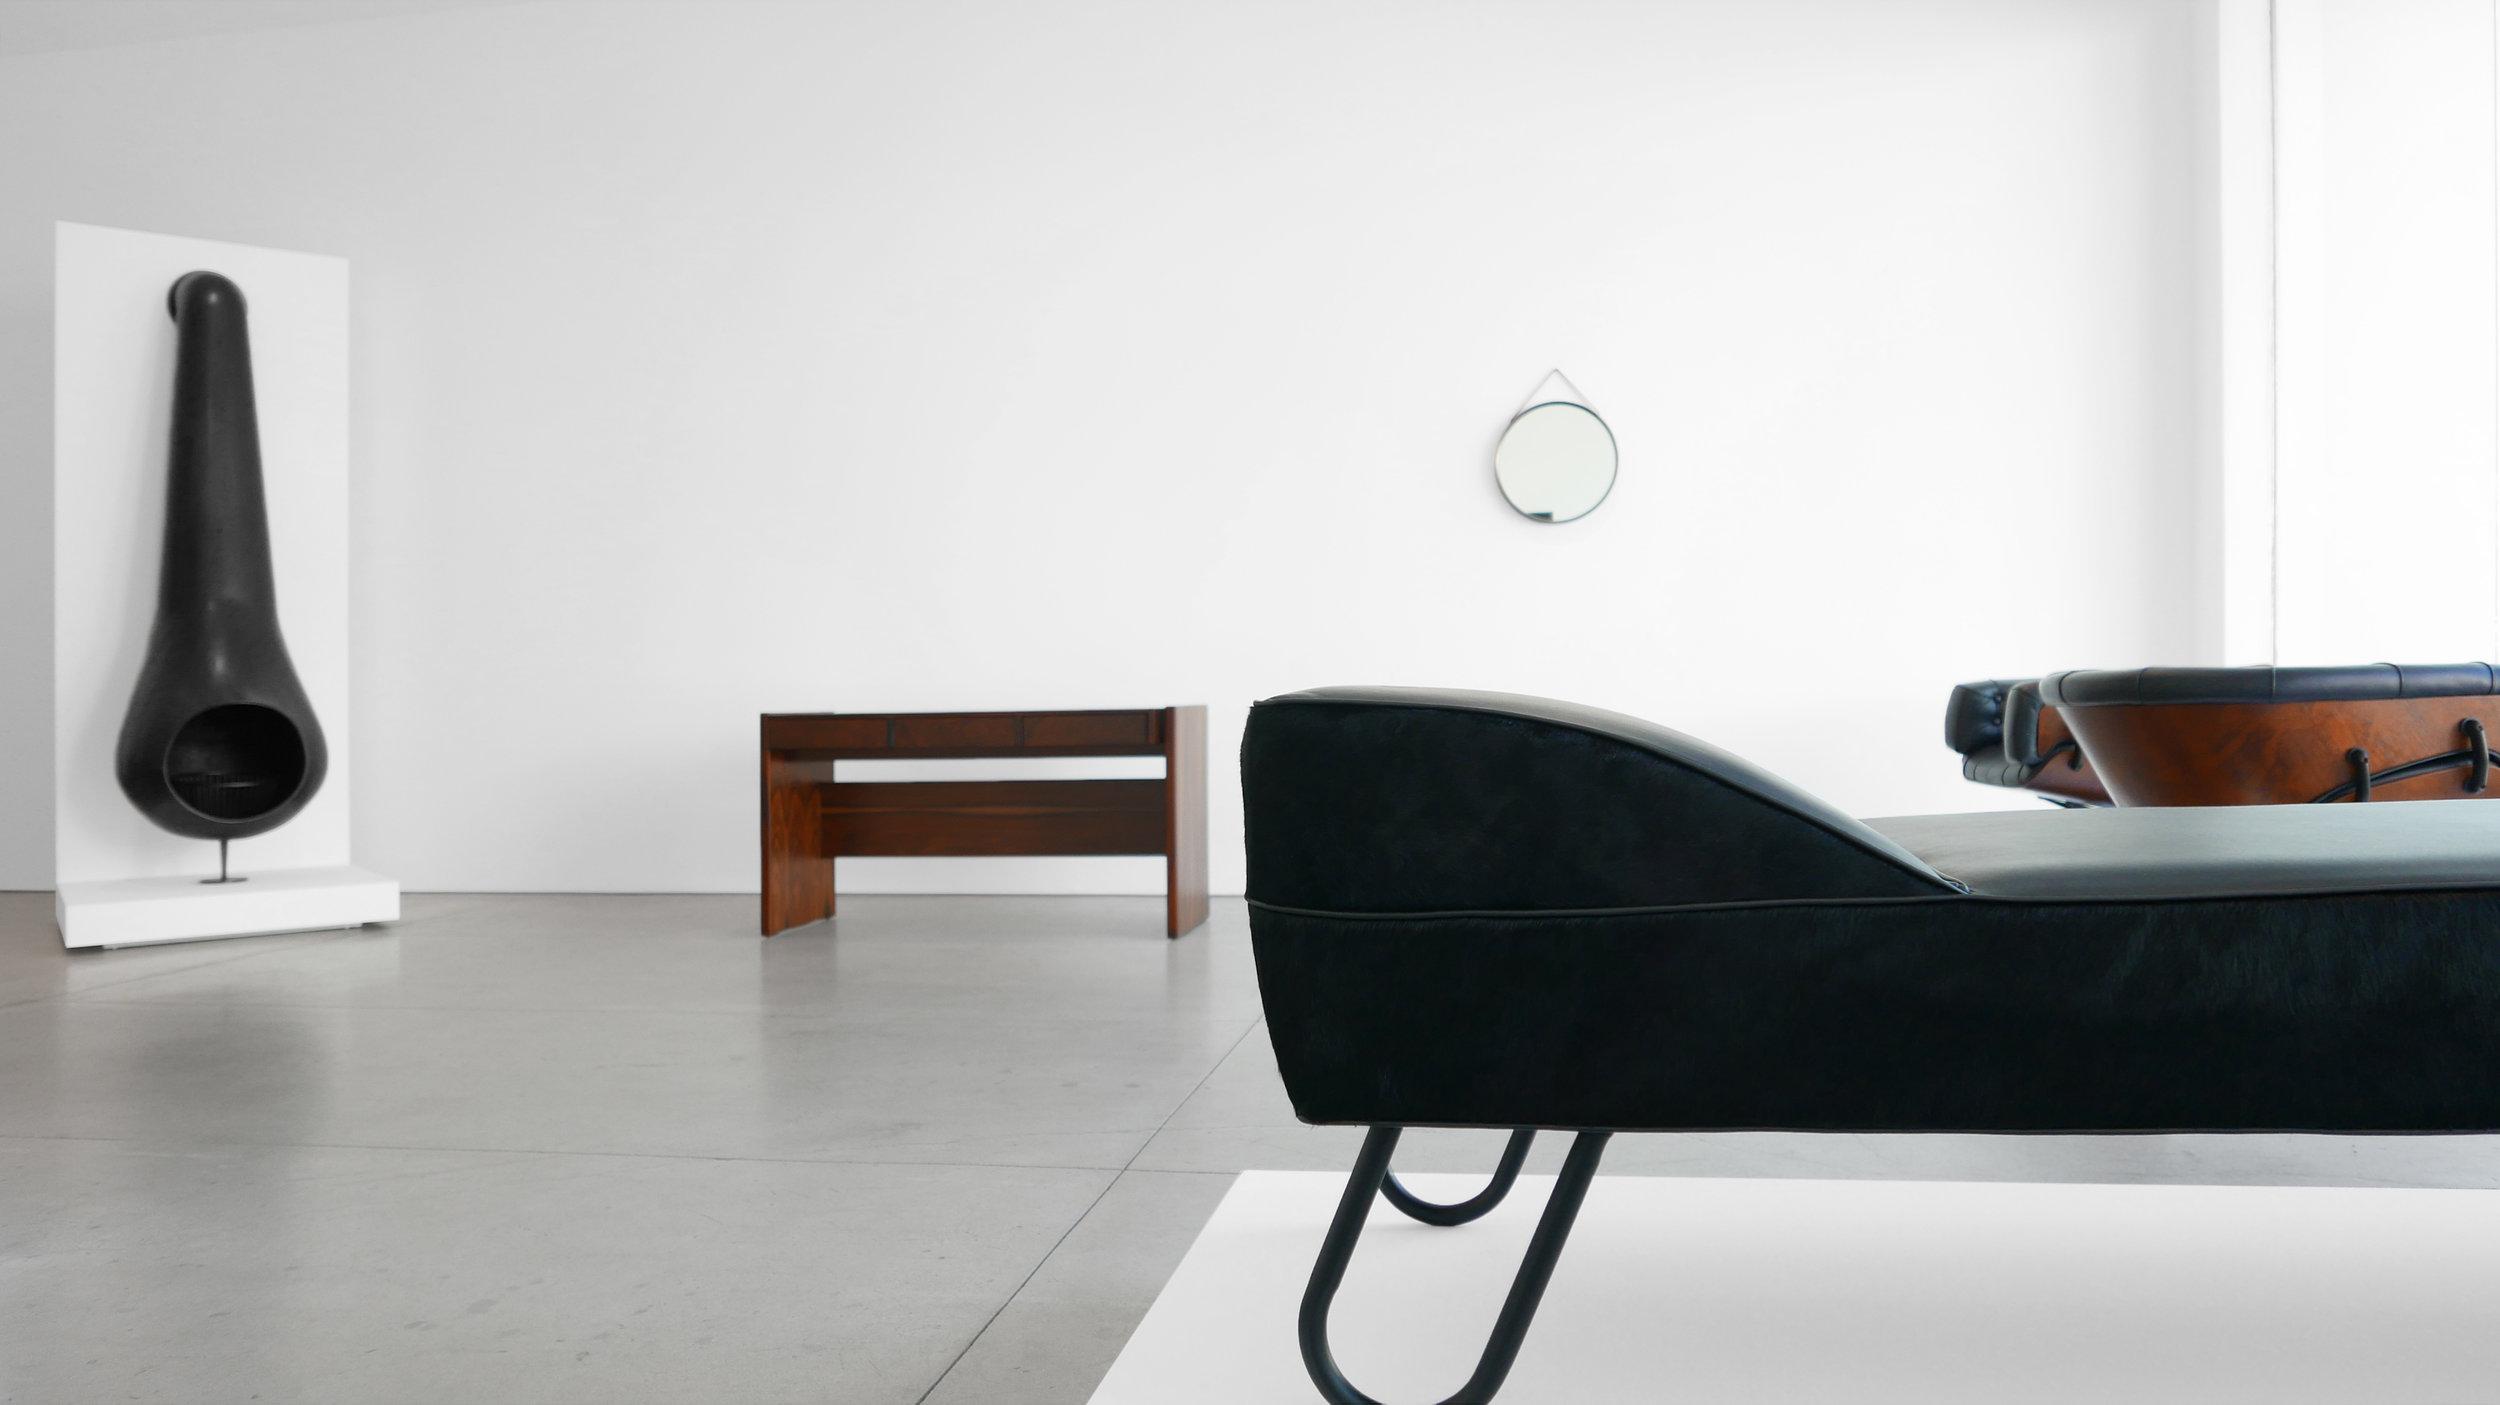 'The Tendency of the Moment - International Design, The Bauhaus Through Modern', Peter Blake Gallery, 2016, Installation View_1.jpg